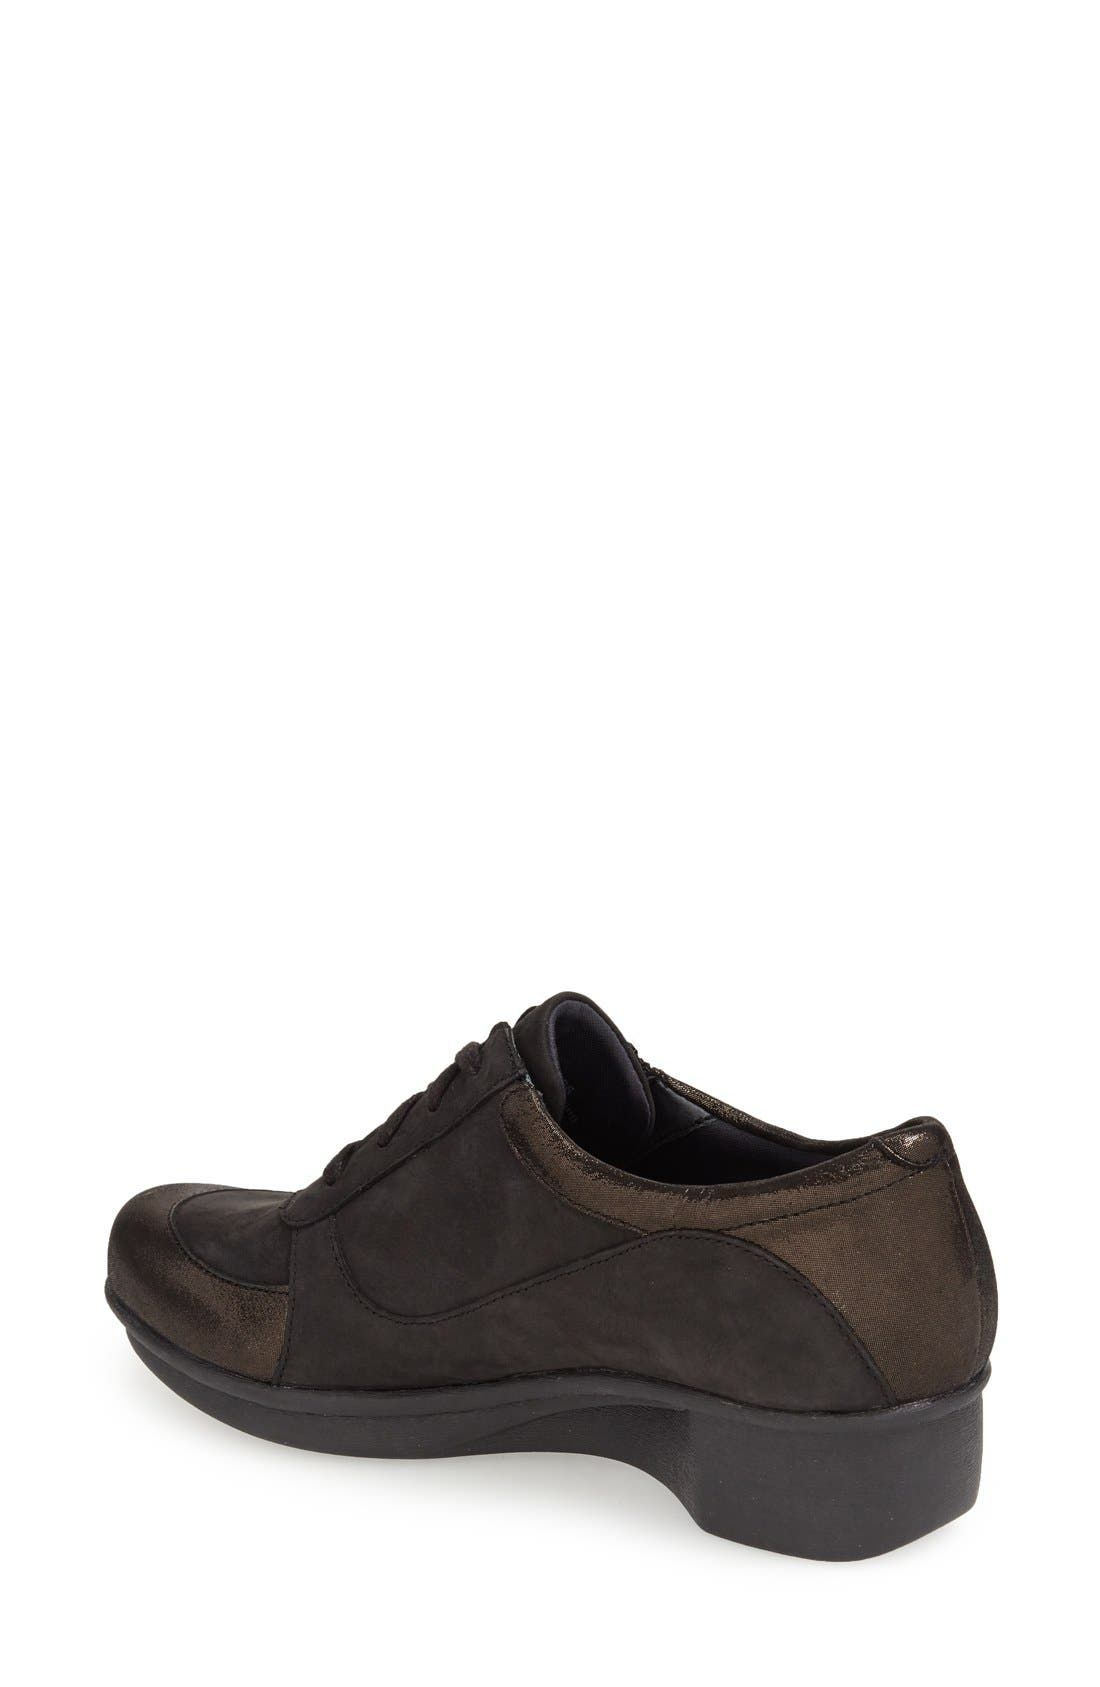 DANSKO,                             'Loretta' Platform Sneaker,                             Alternate thumbnail 2, color,                             001